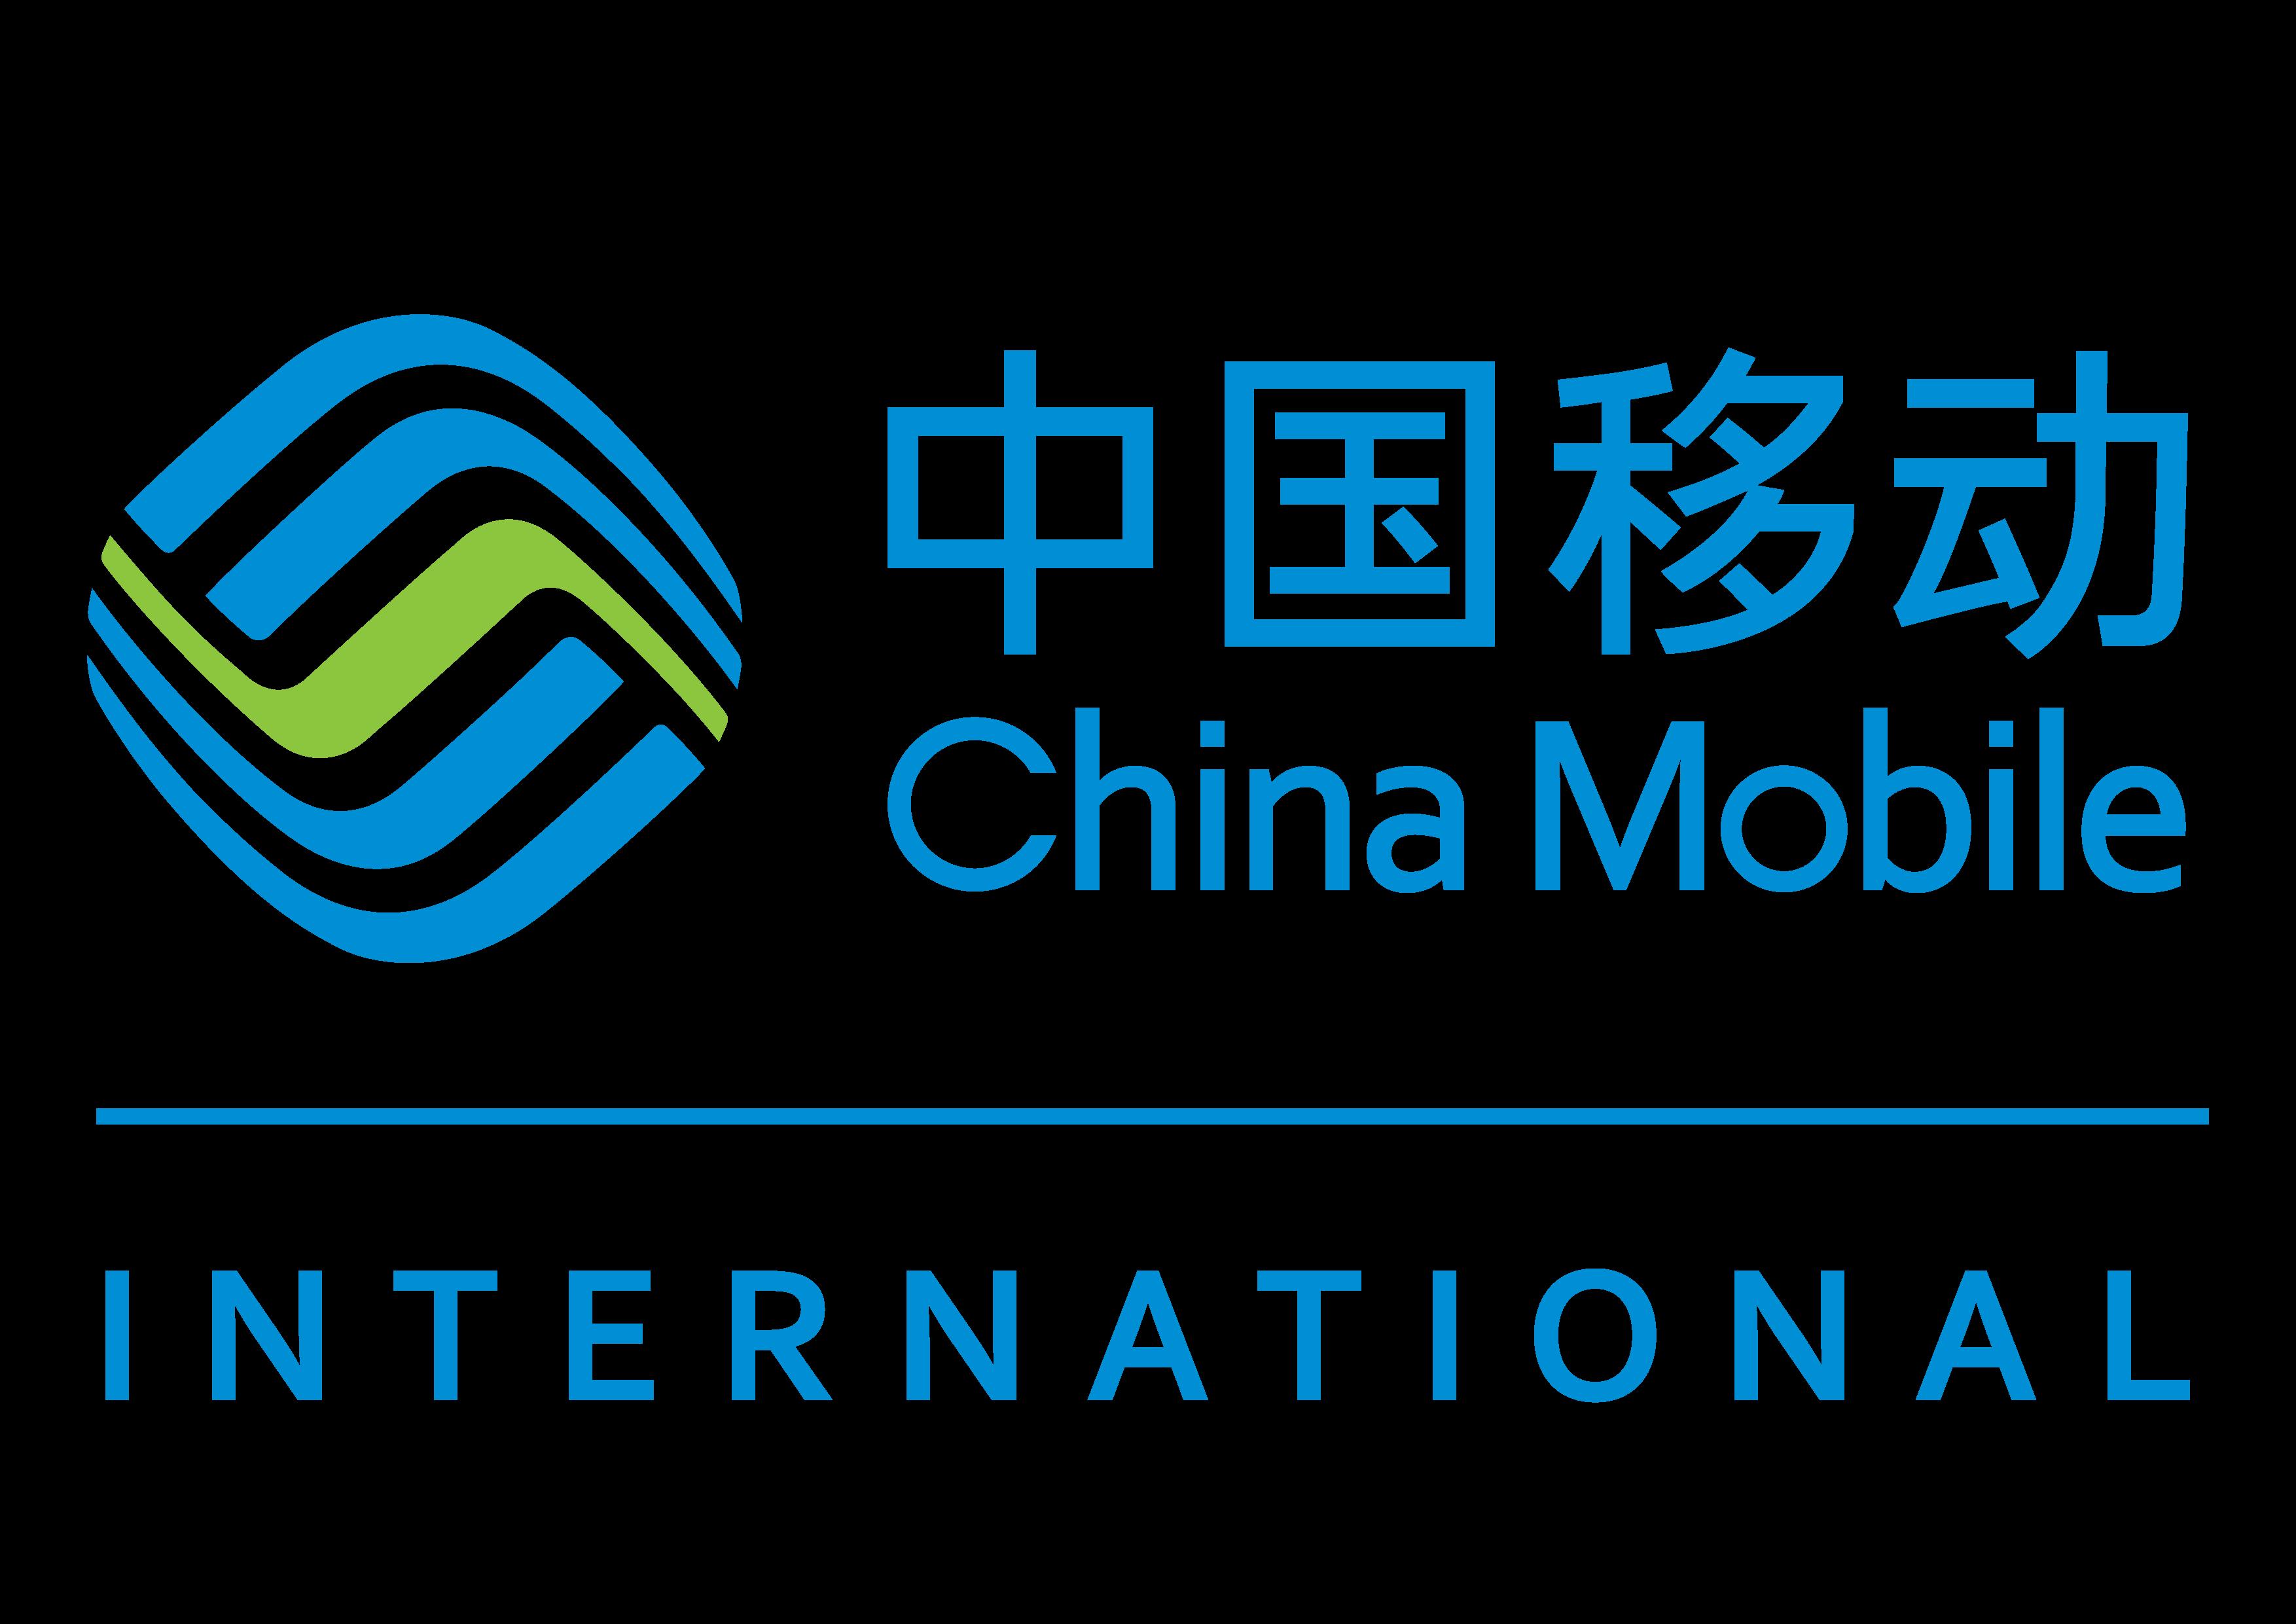 hiboost-logo-中国移动